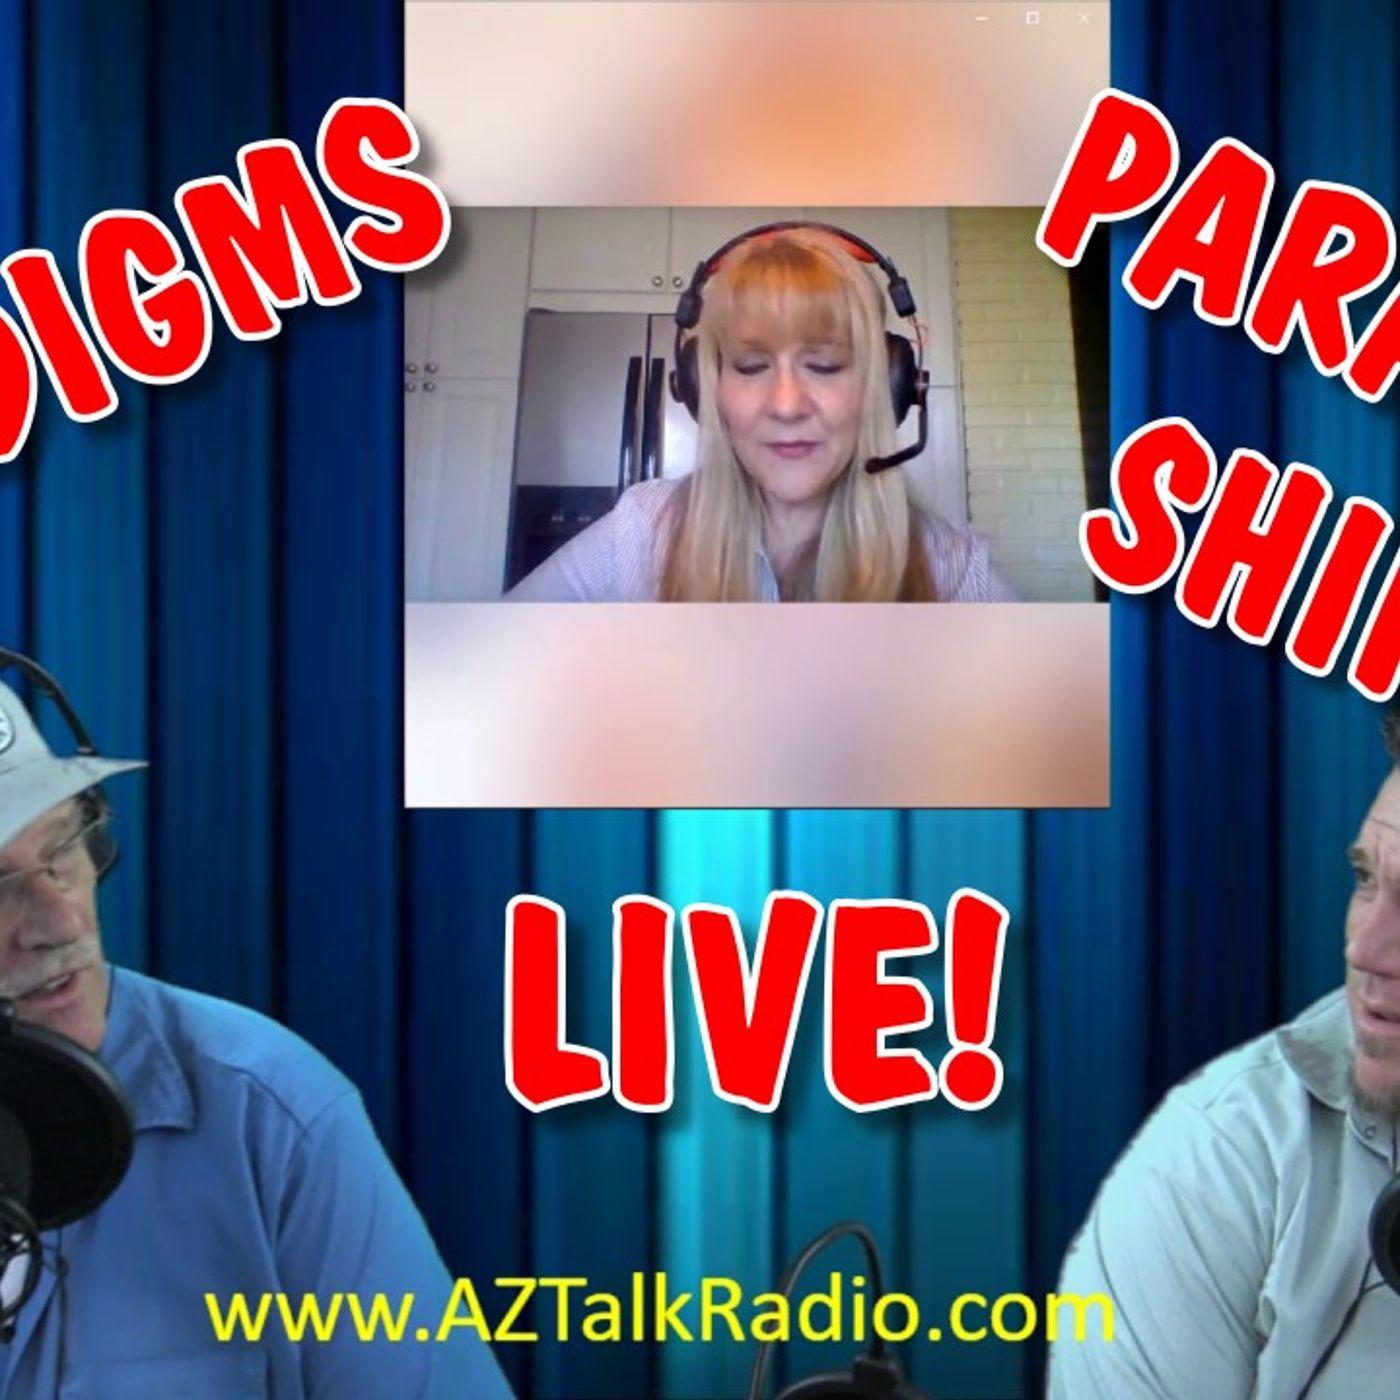 Paradigms & Paradigm Shifting, with Rob, Derek and Helen , Arizona Talk Radio Episode 55